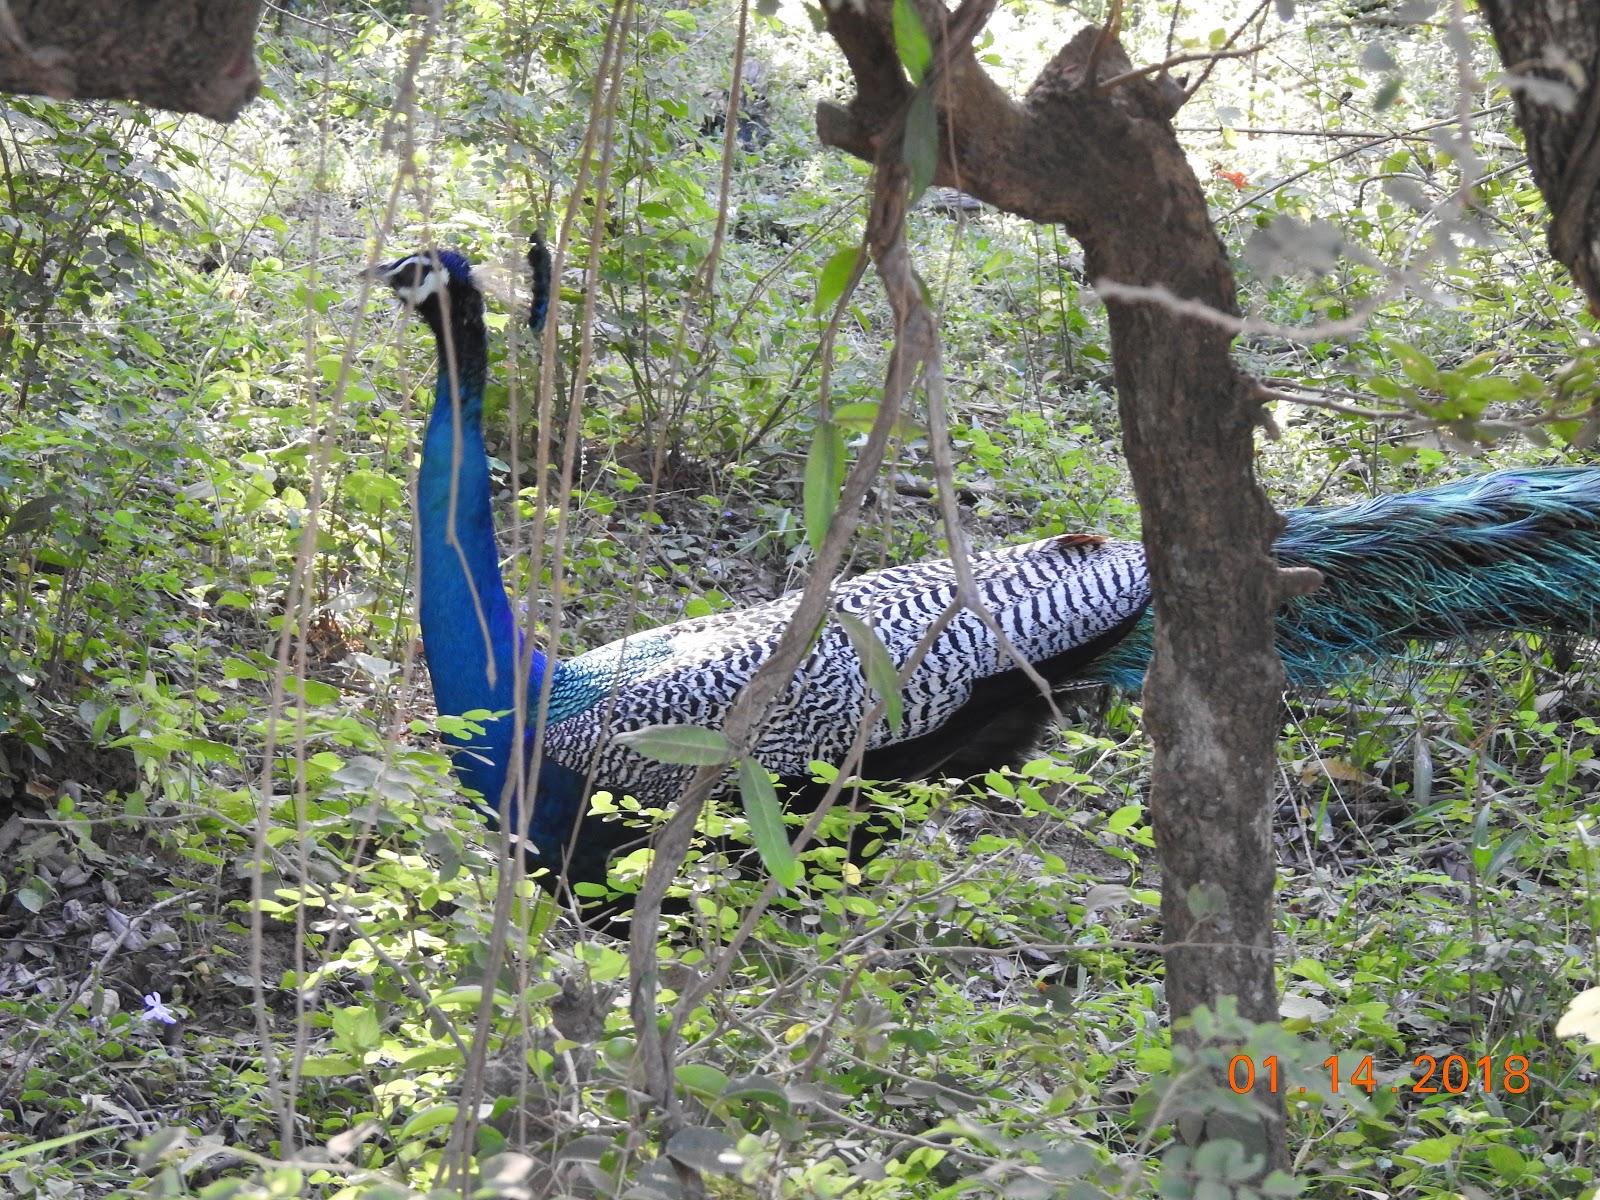 invite-to-paradise-sri-lanka-maldives-holiday-specialists-nutan-vidyut-patel-peacock-2.jpg